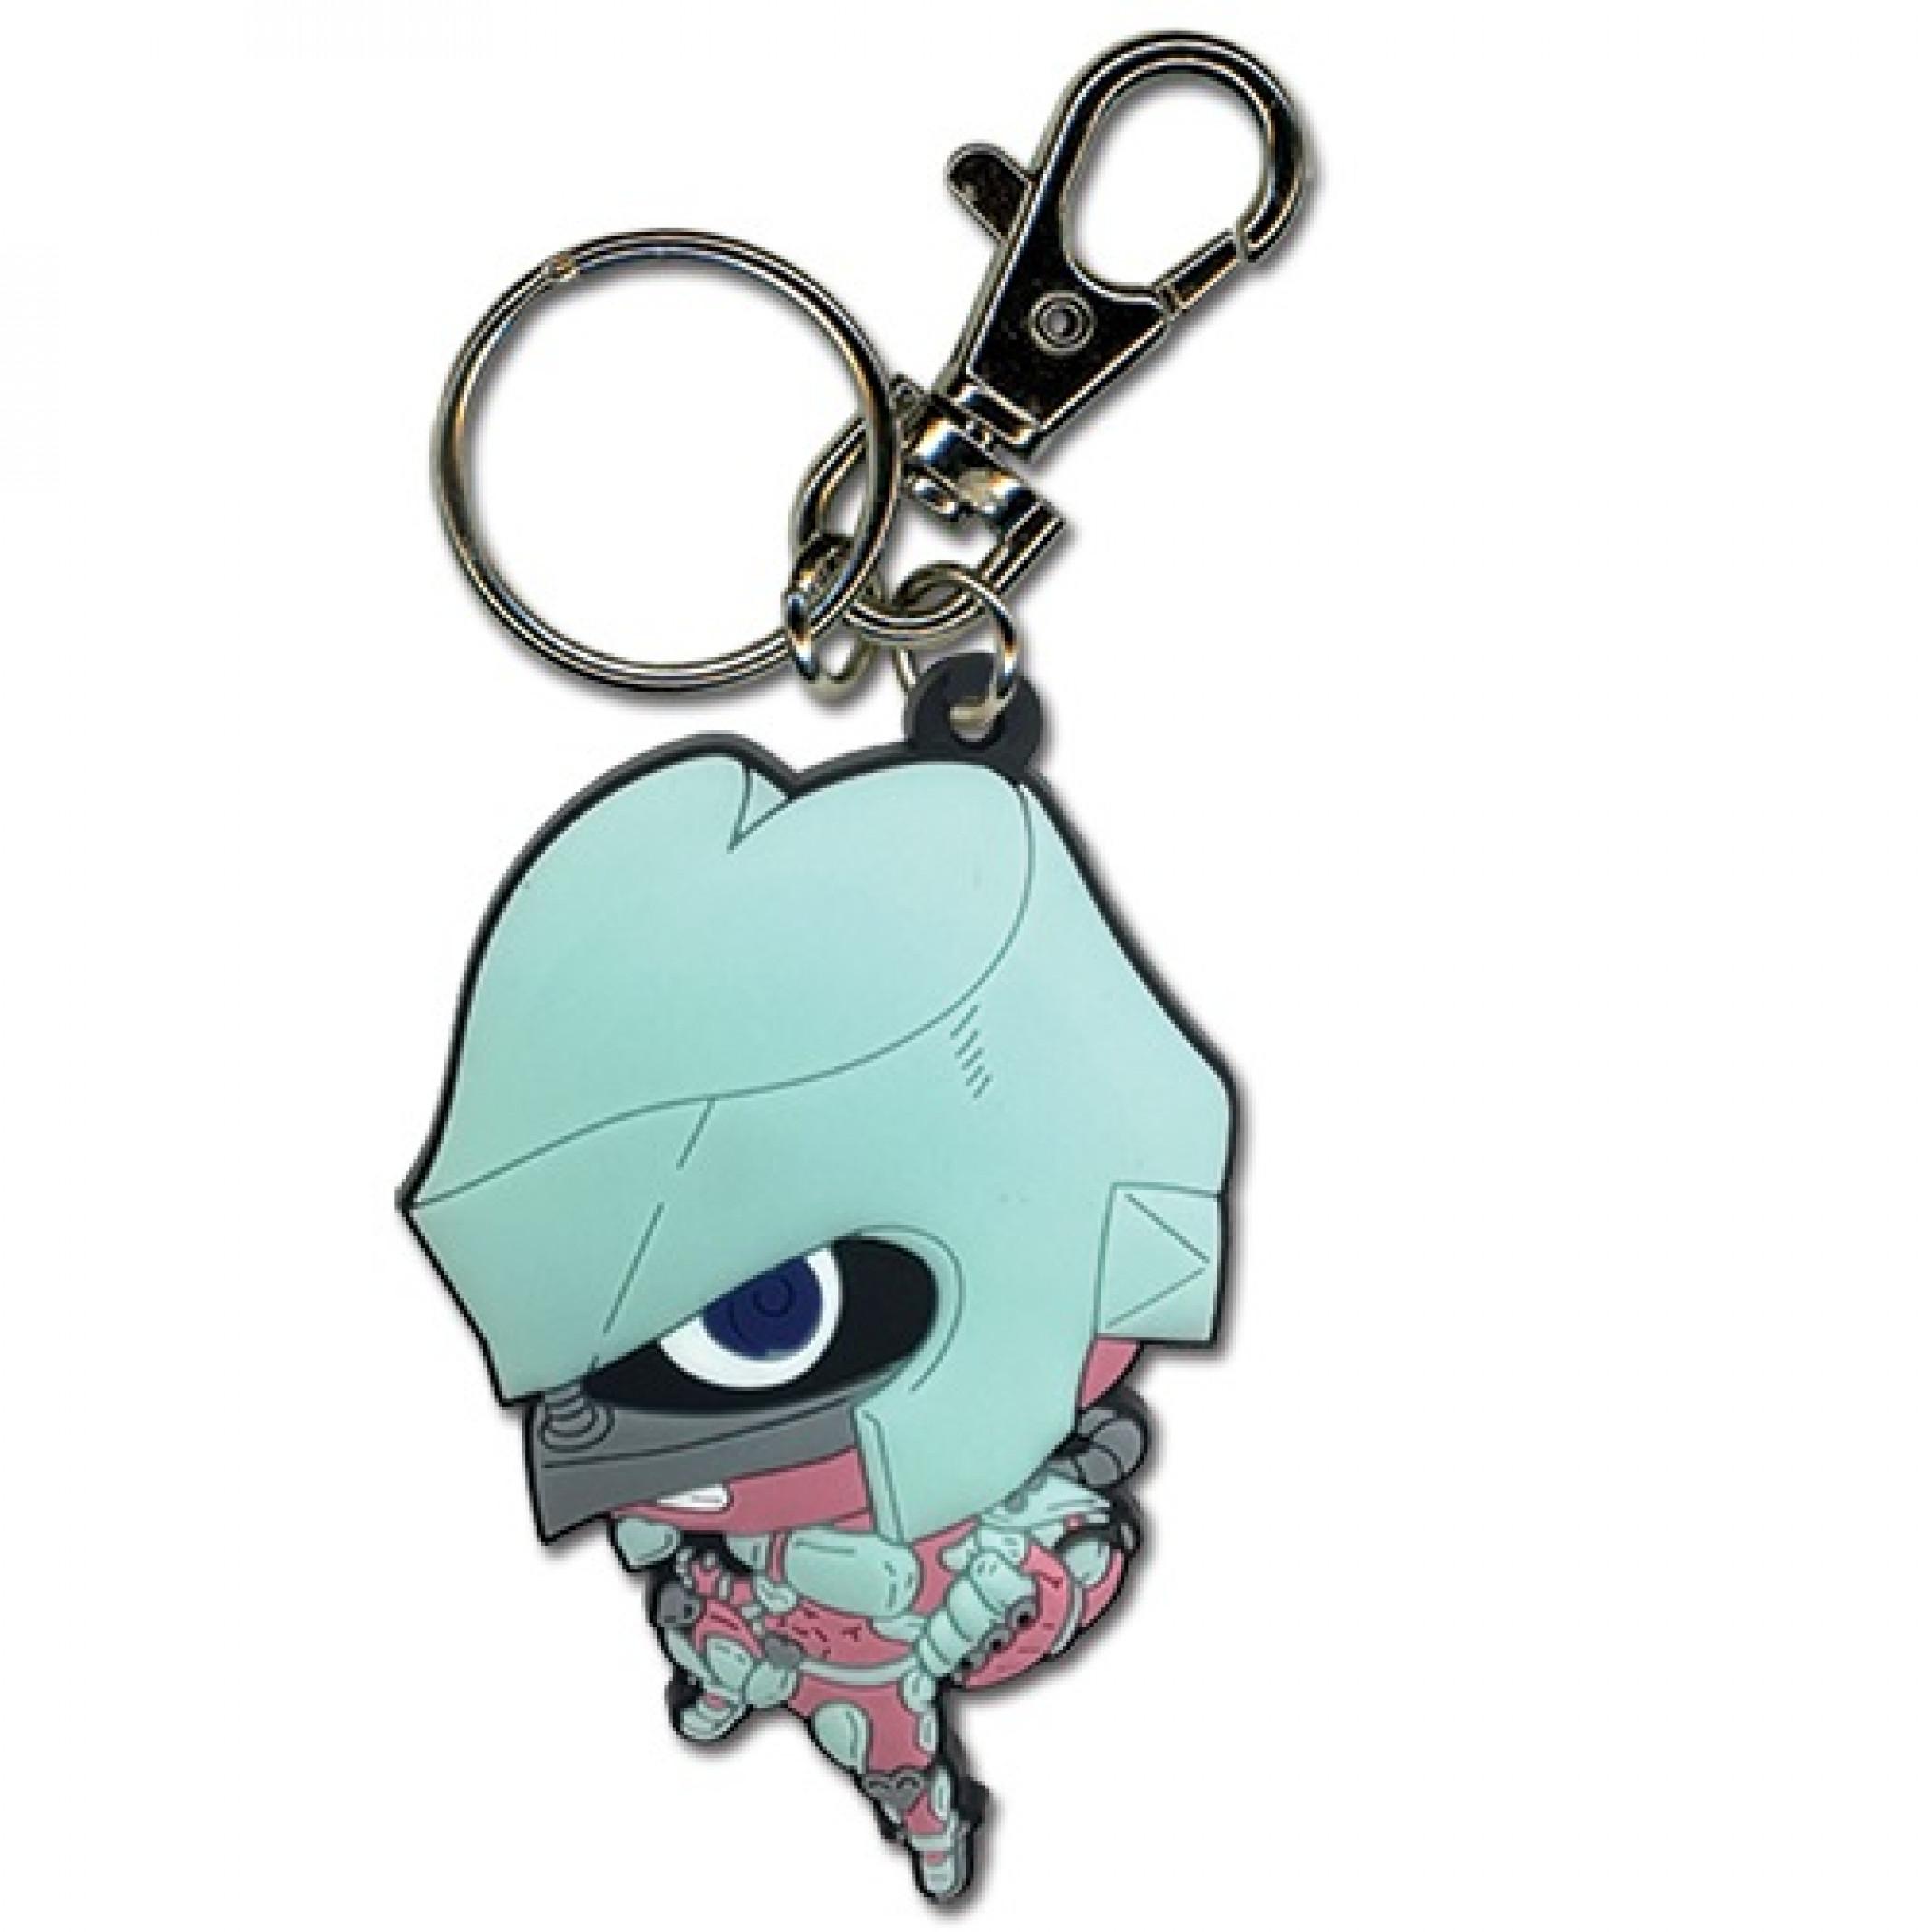 JoJo's Diamond Is Unbreakable Shining Diamond Stand PVC Keychain